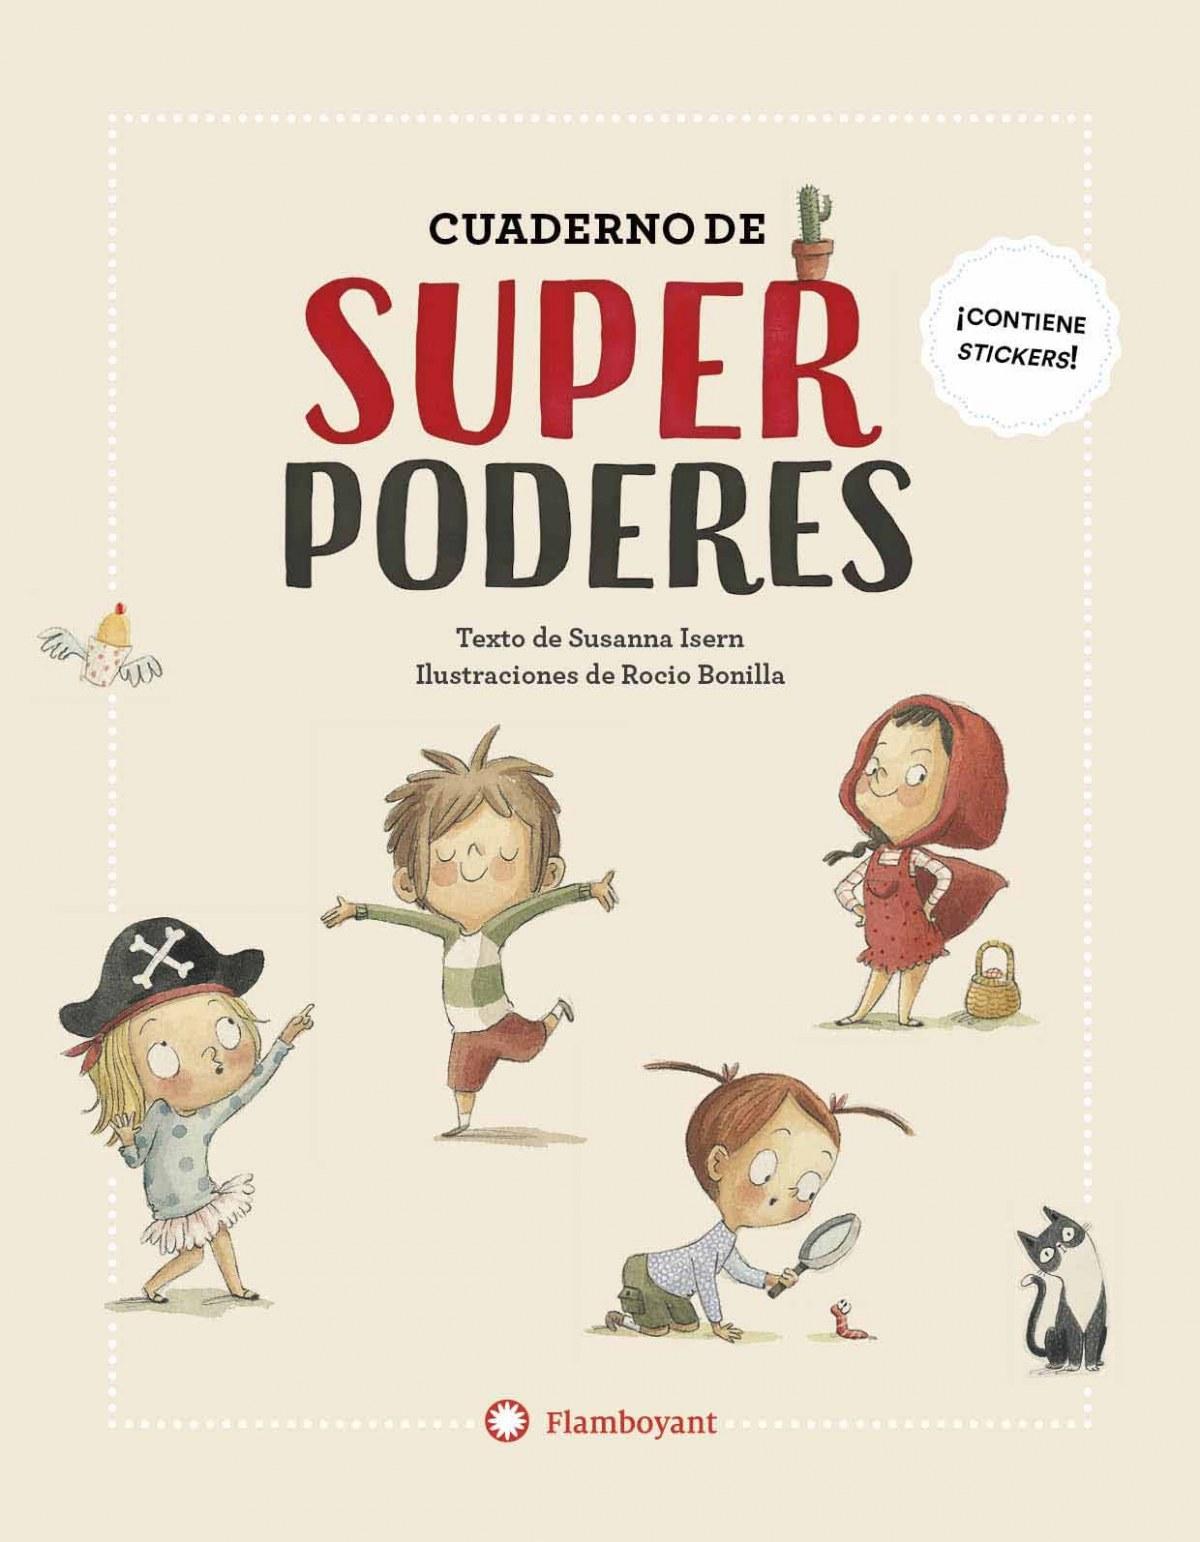 CUADERNO DE SUPERPODERES